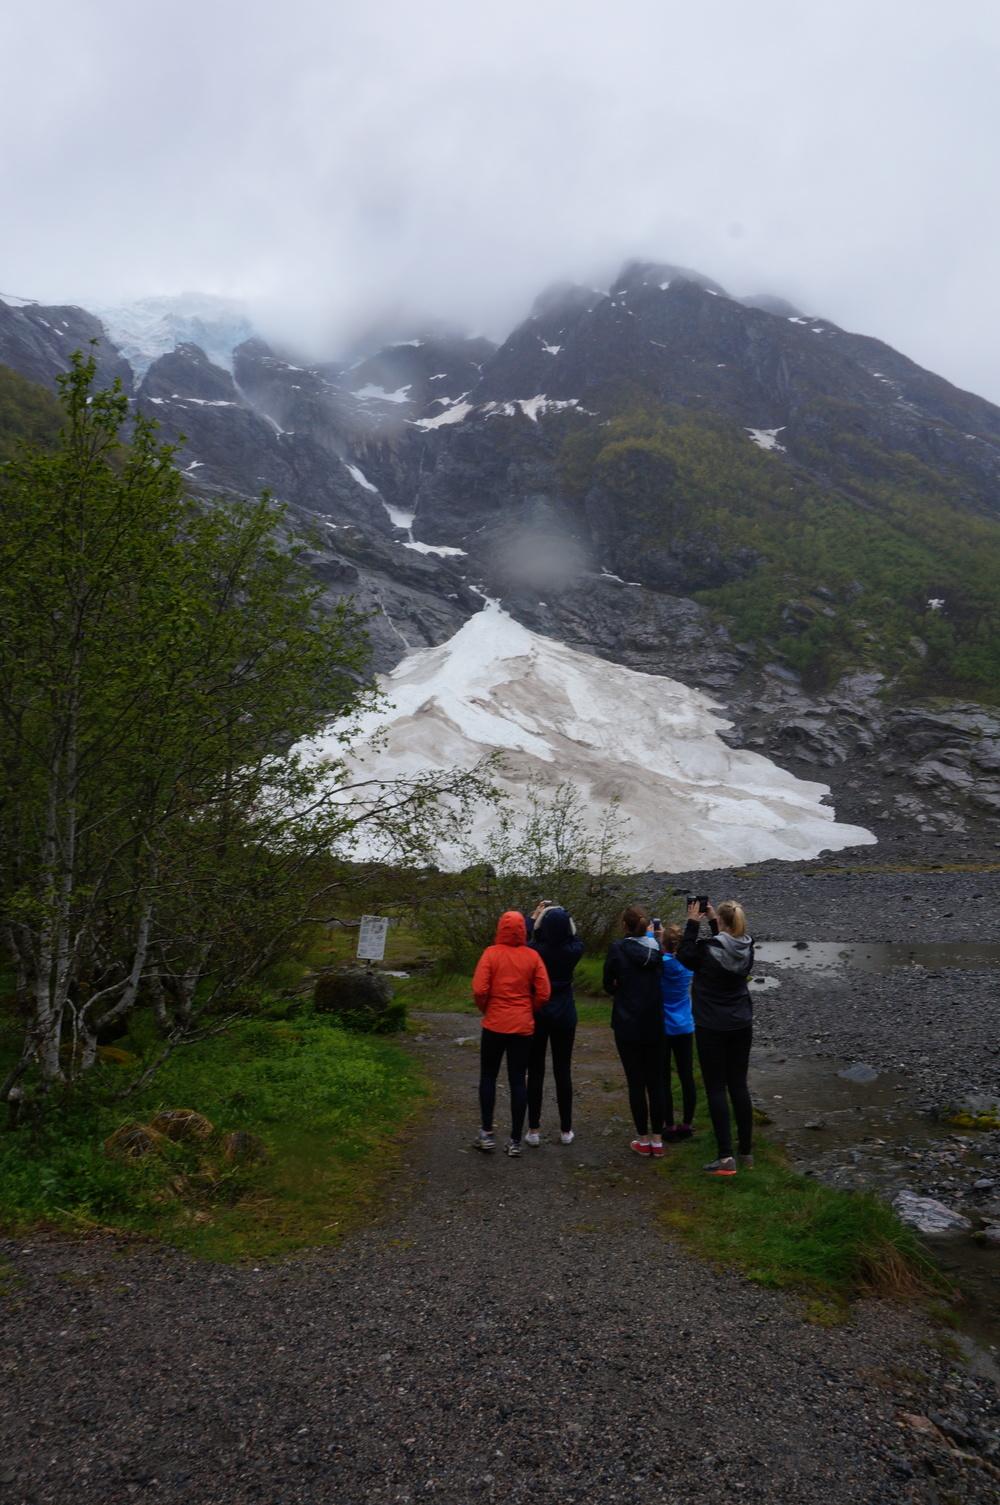 Vidaregåande elevar observerarSupphellebreen i Fjærland under ein ekskursjon. Foto:Monica Østbye Hansen.